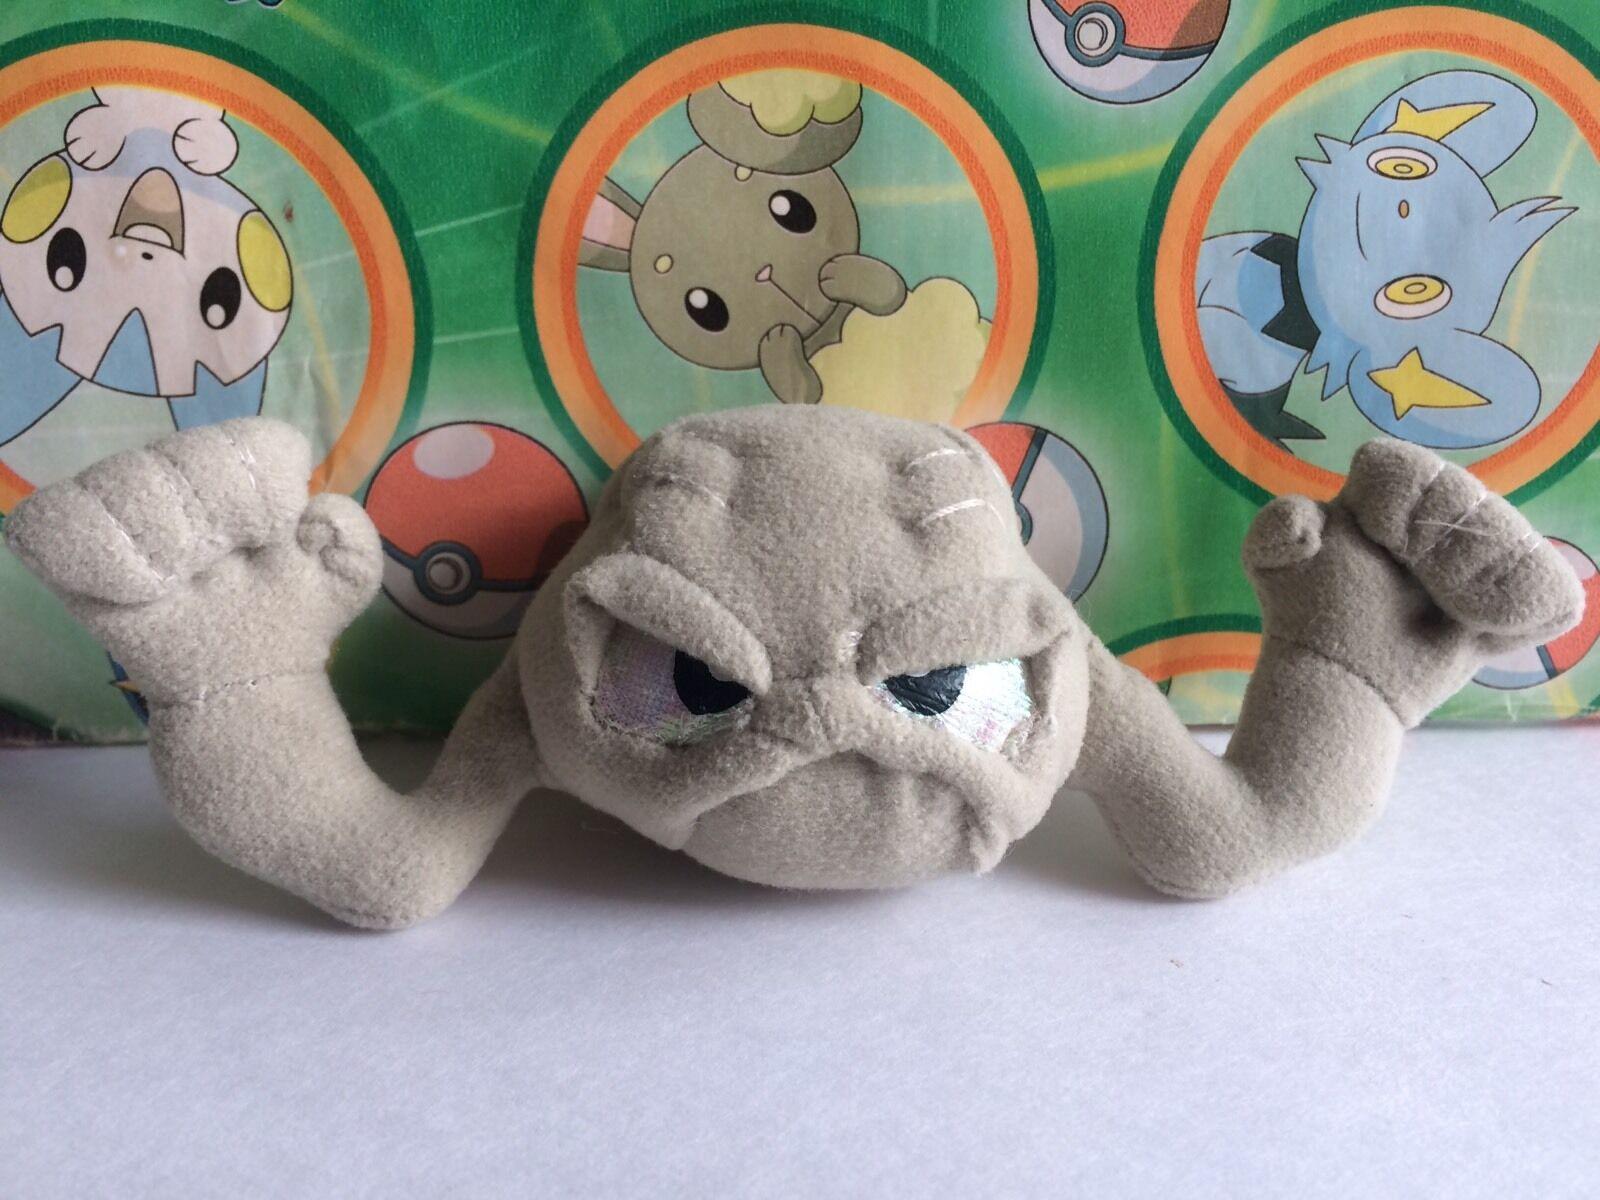 Pokemon Plush Geodude Applause Plush Stuffed Animal Toy Go figure Doll US Seller